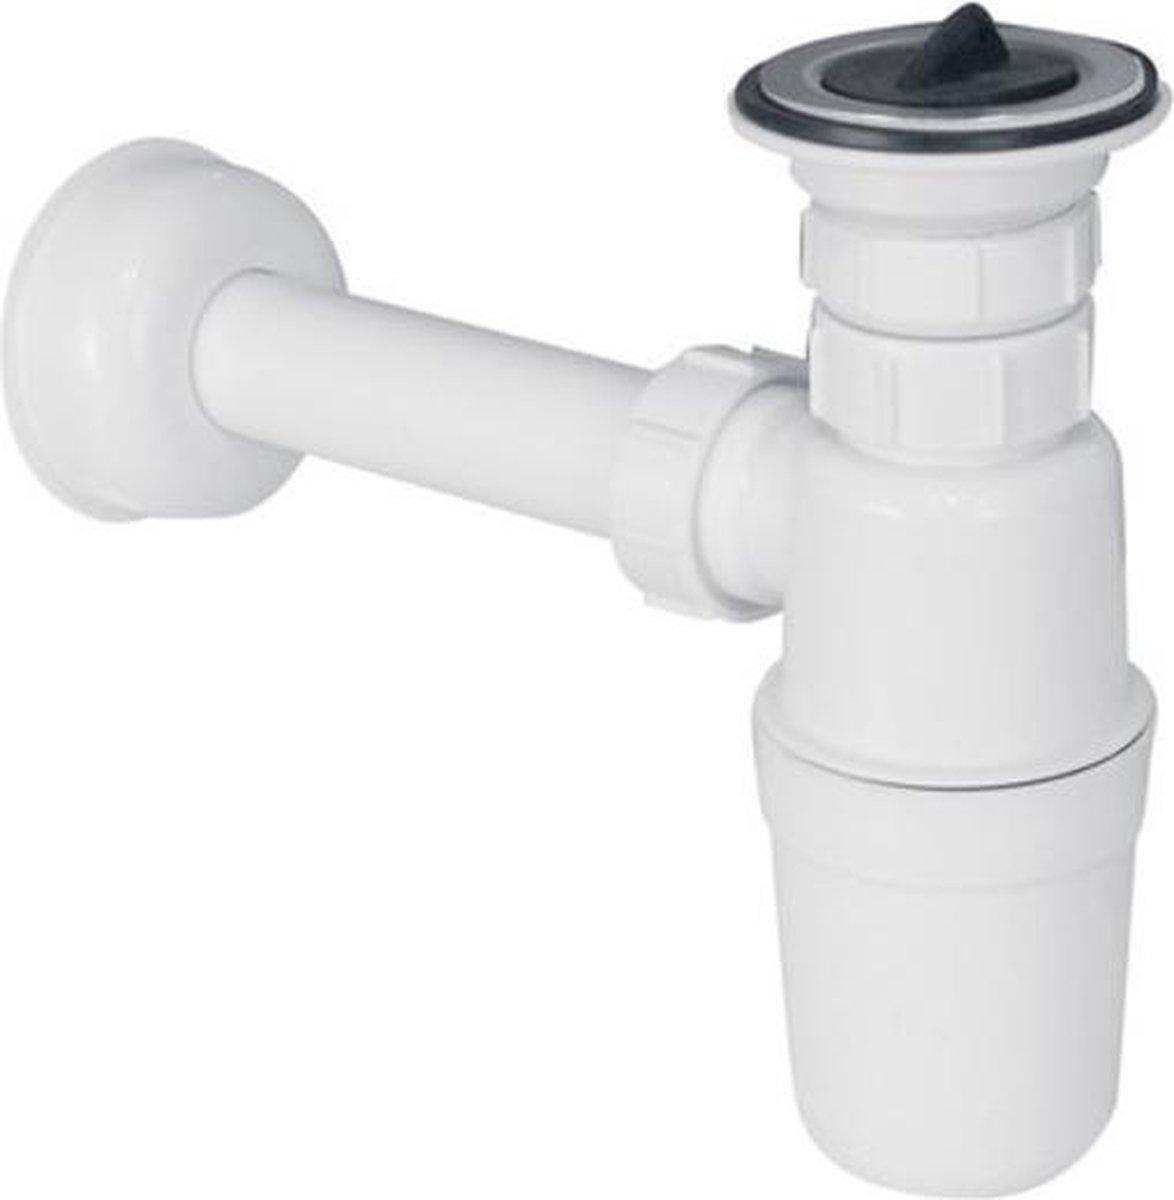 Nemo Go sifon voor lavabo wit plug